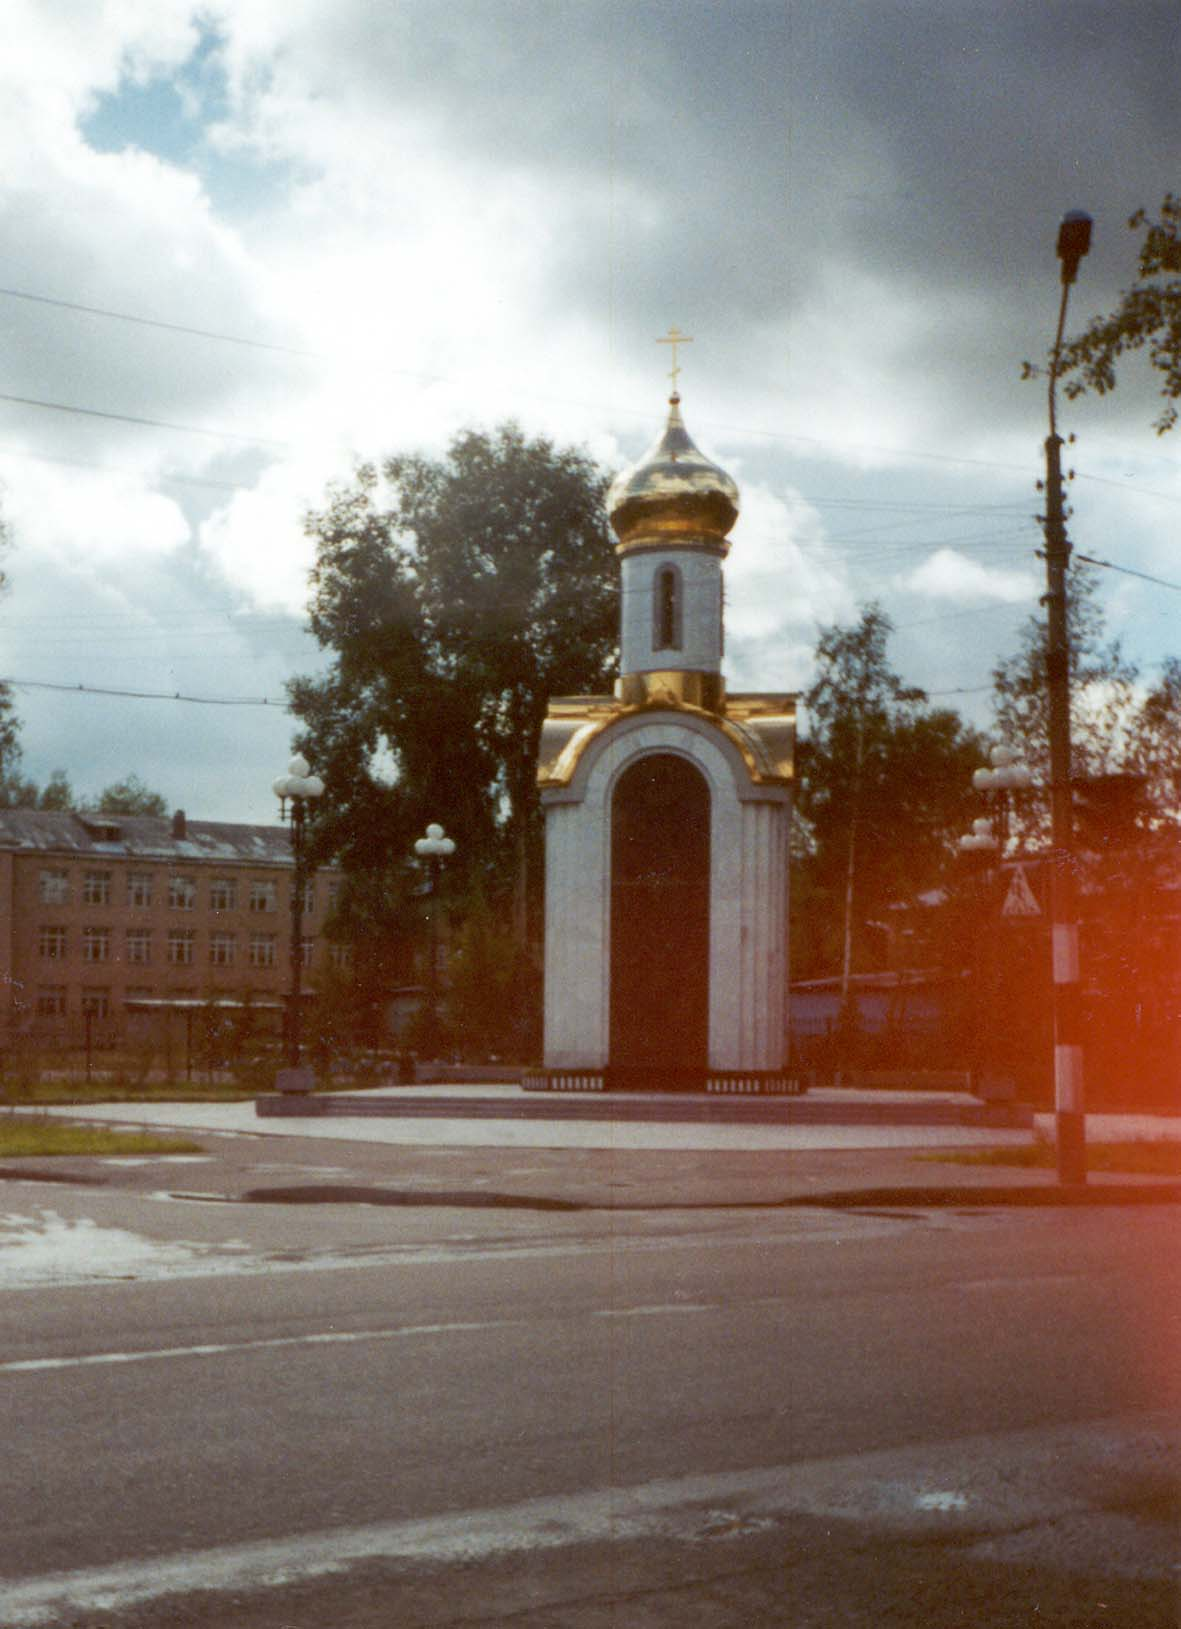 http://www.sakharov-center.ru/asfcd/pam/photos/photo_big/060303P000993.jpg